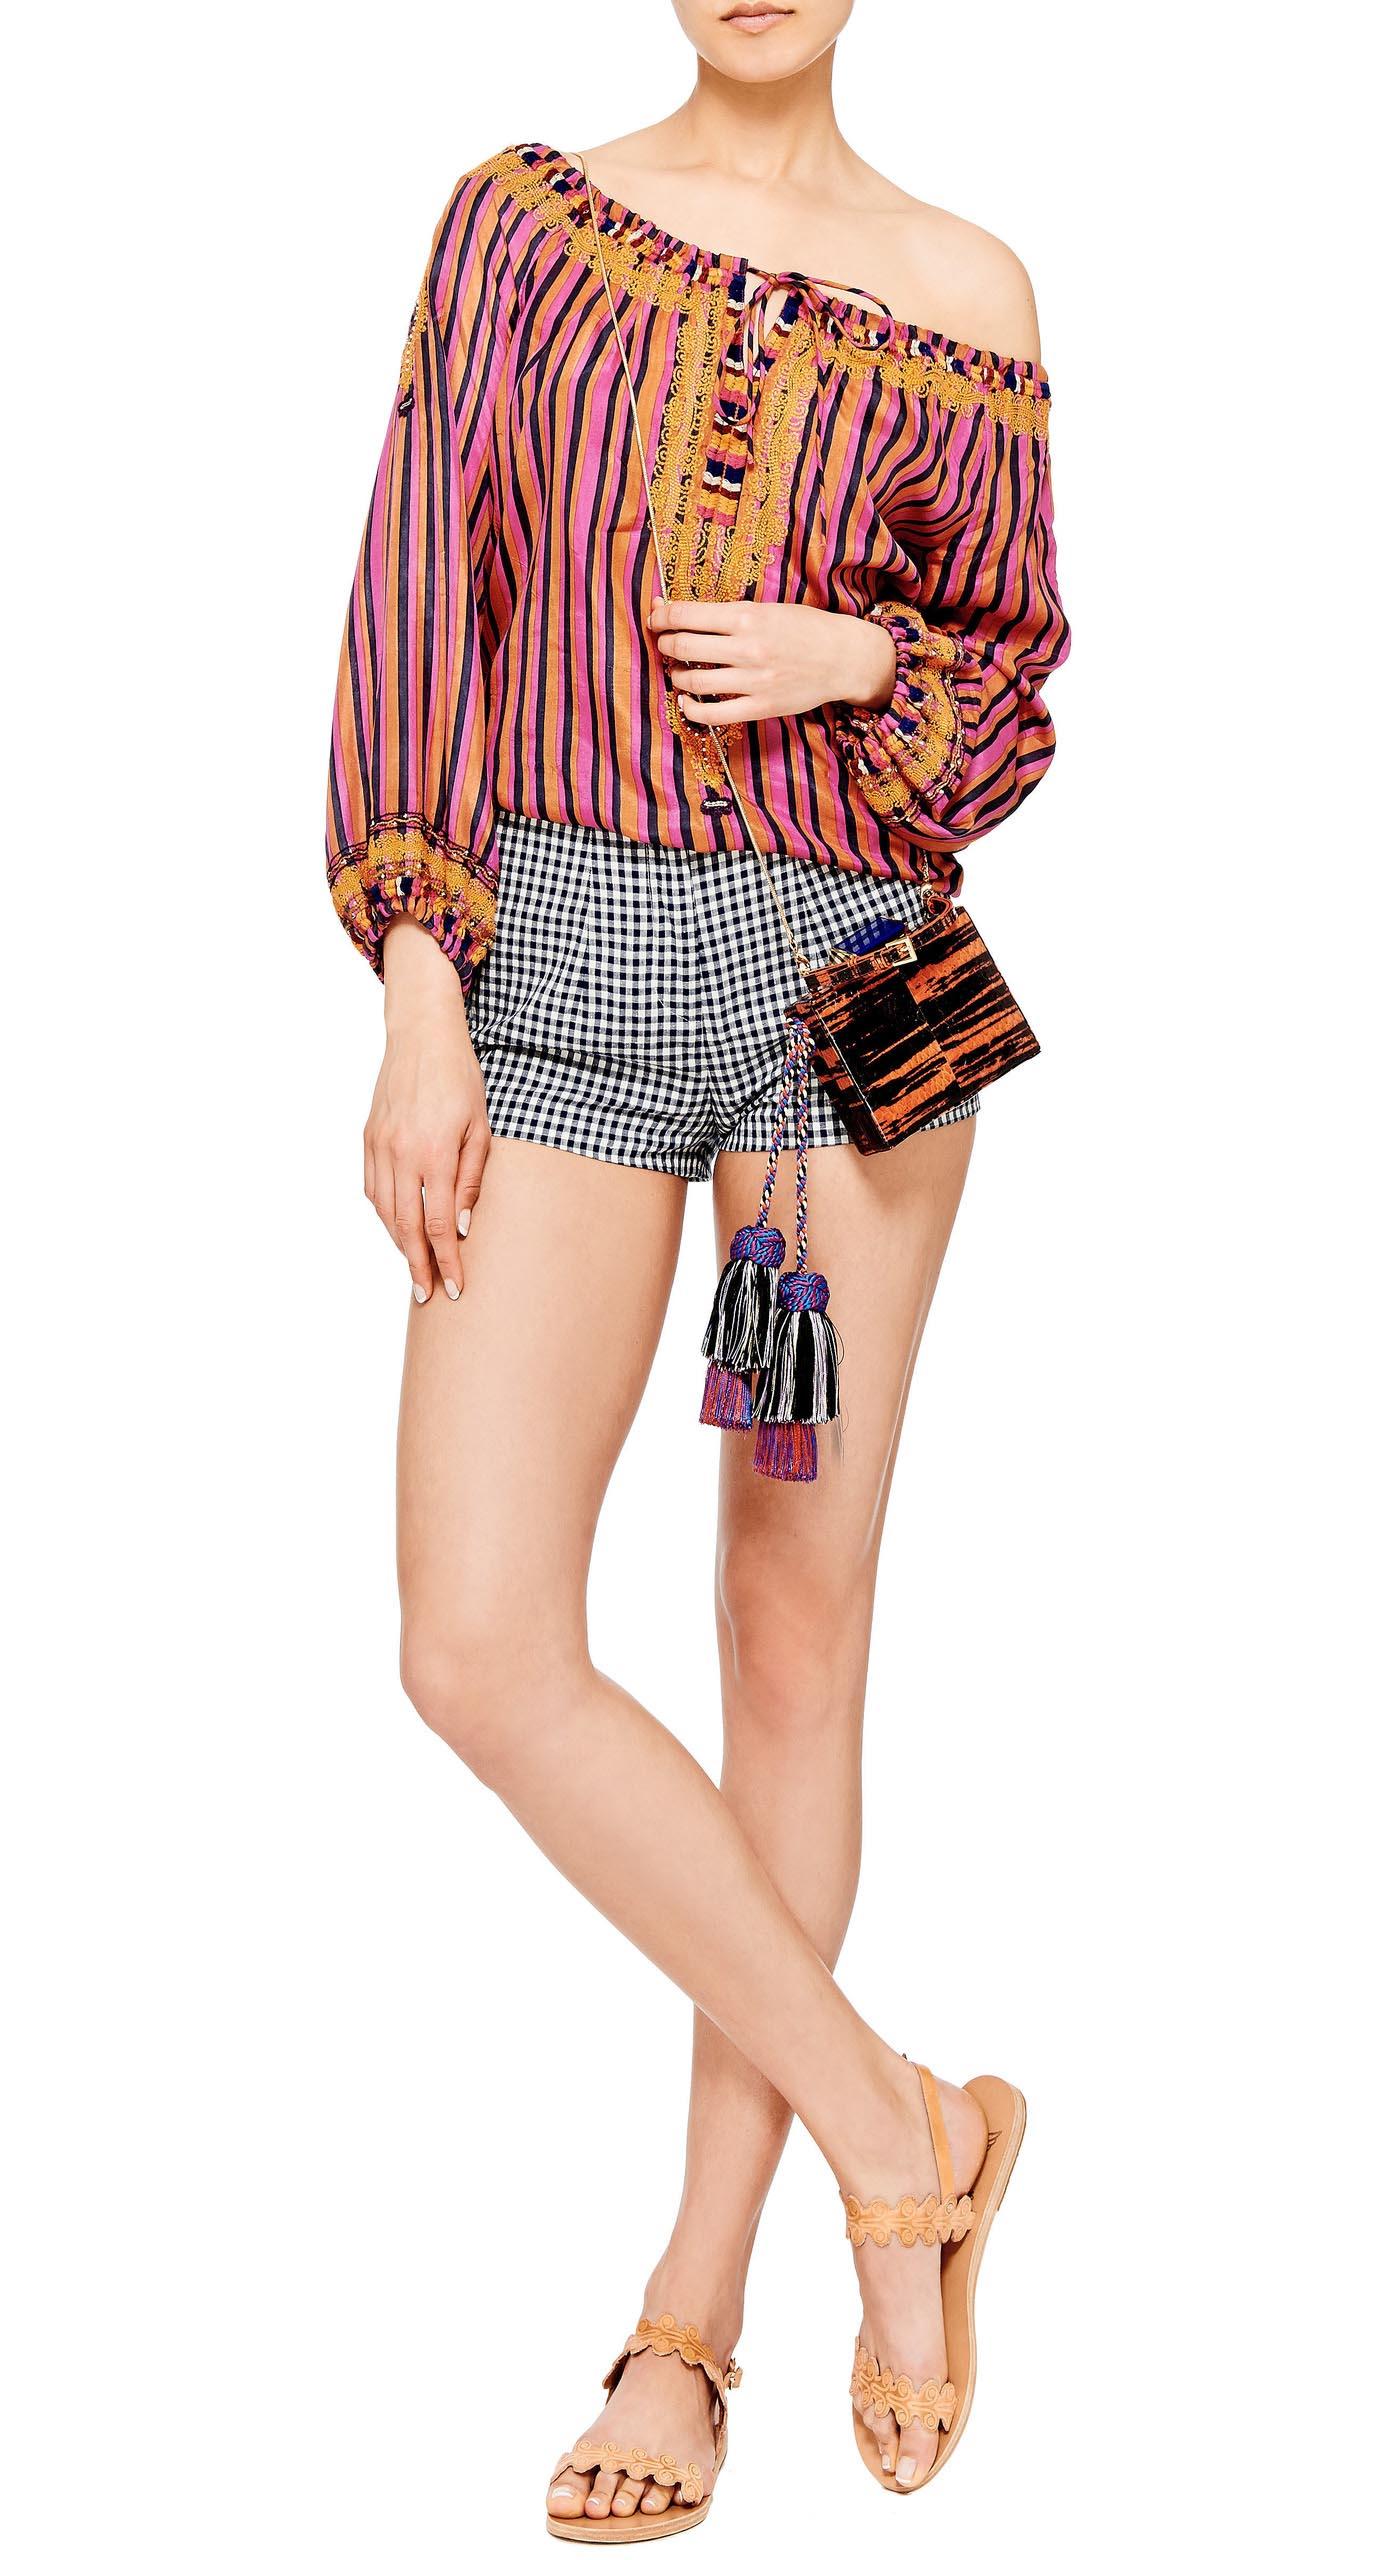 white-shorts-gingham-print-pink-magenta-top-blouse-peasant-tan-shoe-sandals-spring-summer-weekend.jpg